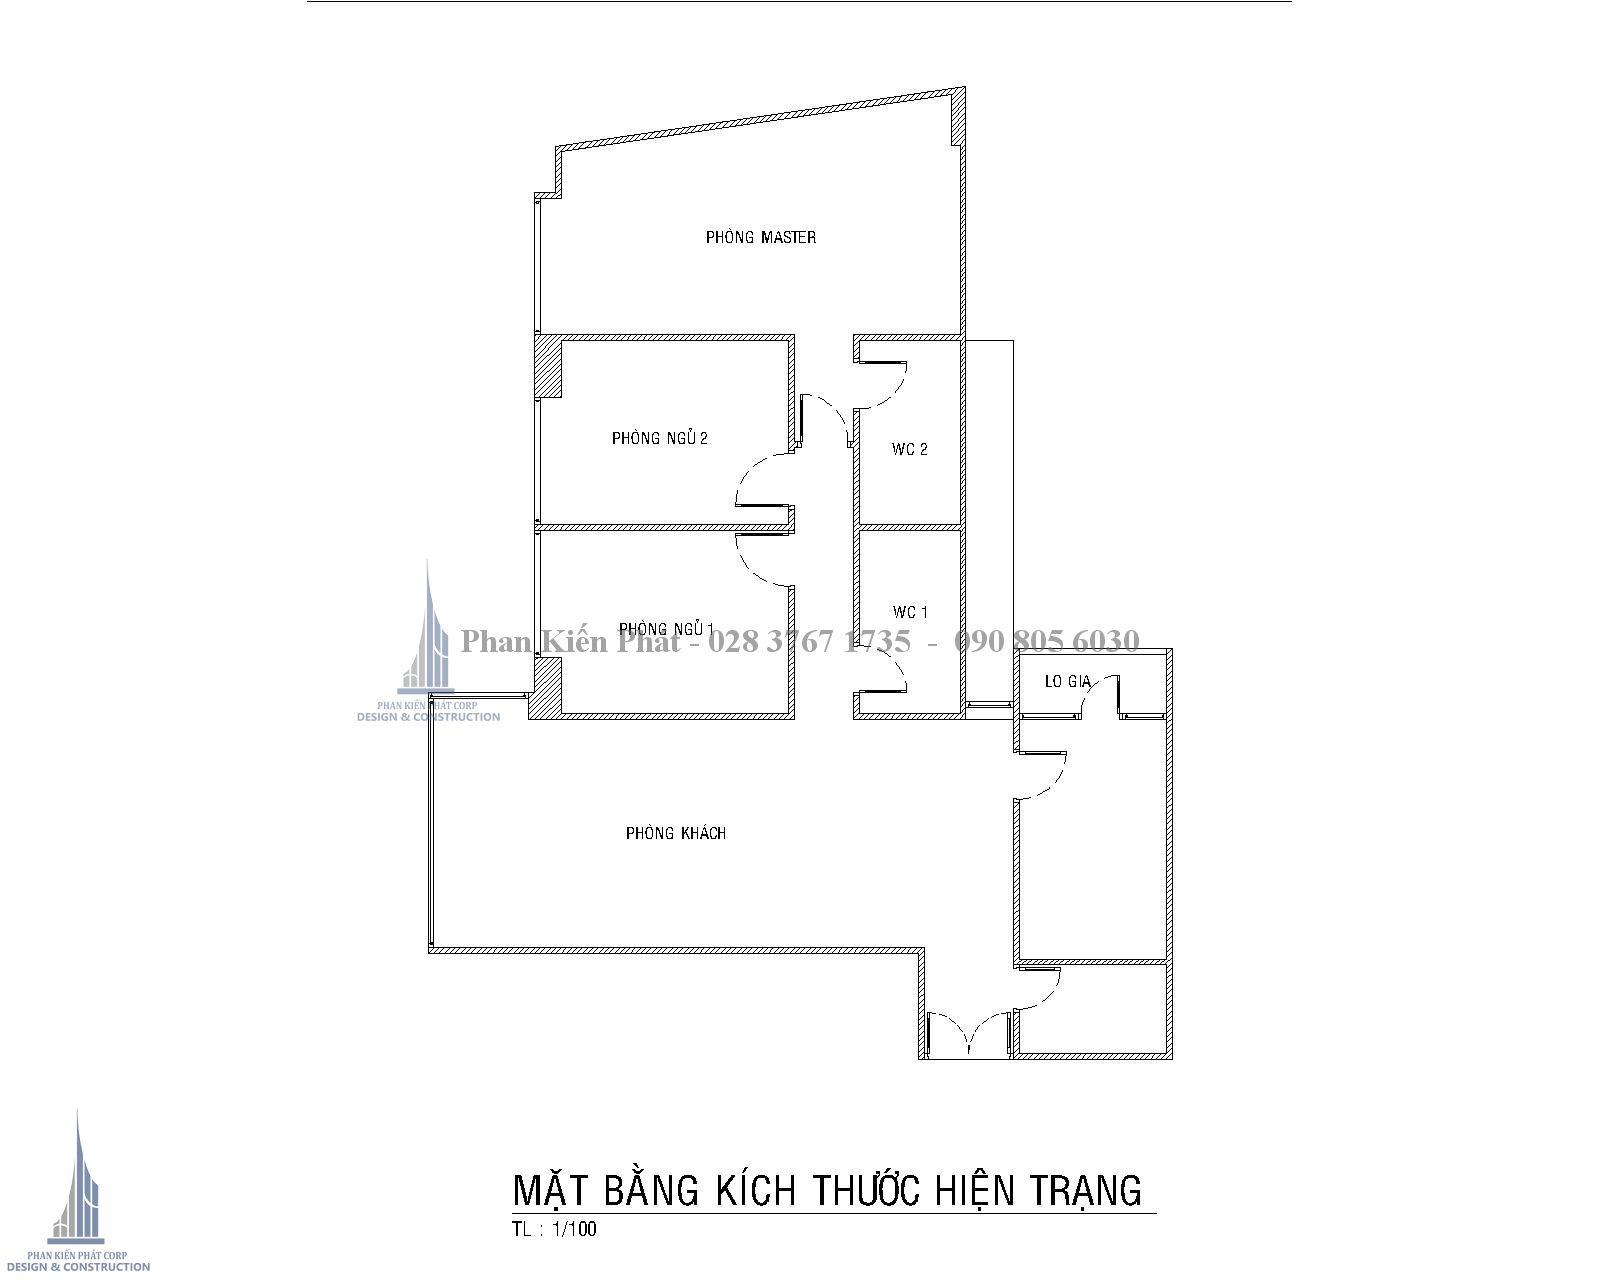 Can Ho Nguyen Huu Canh Mat Bang Kich Thuoc Hien Trang